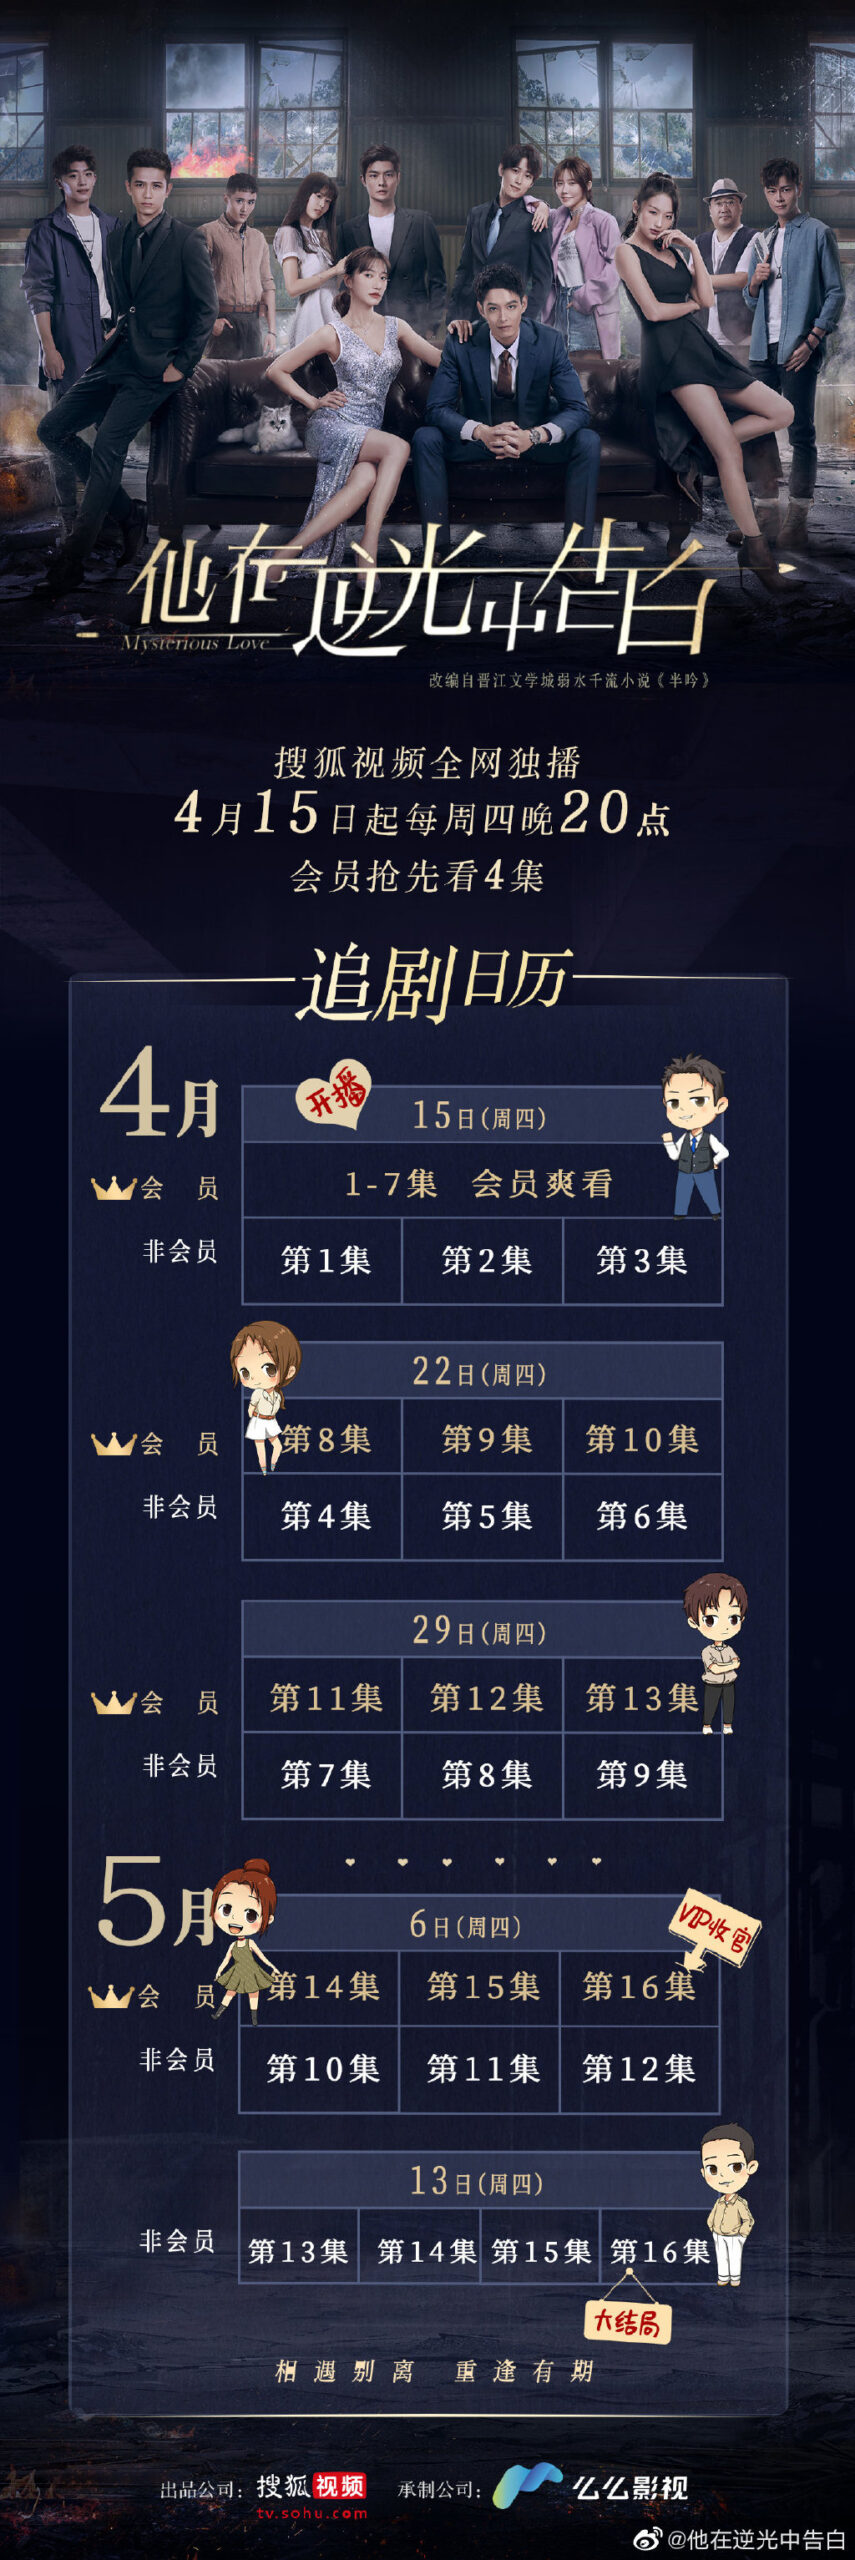 Mysterious Love Chinese Drama Airing Calendar